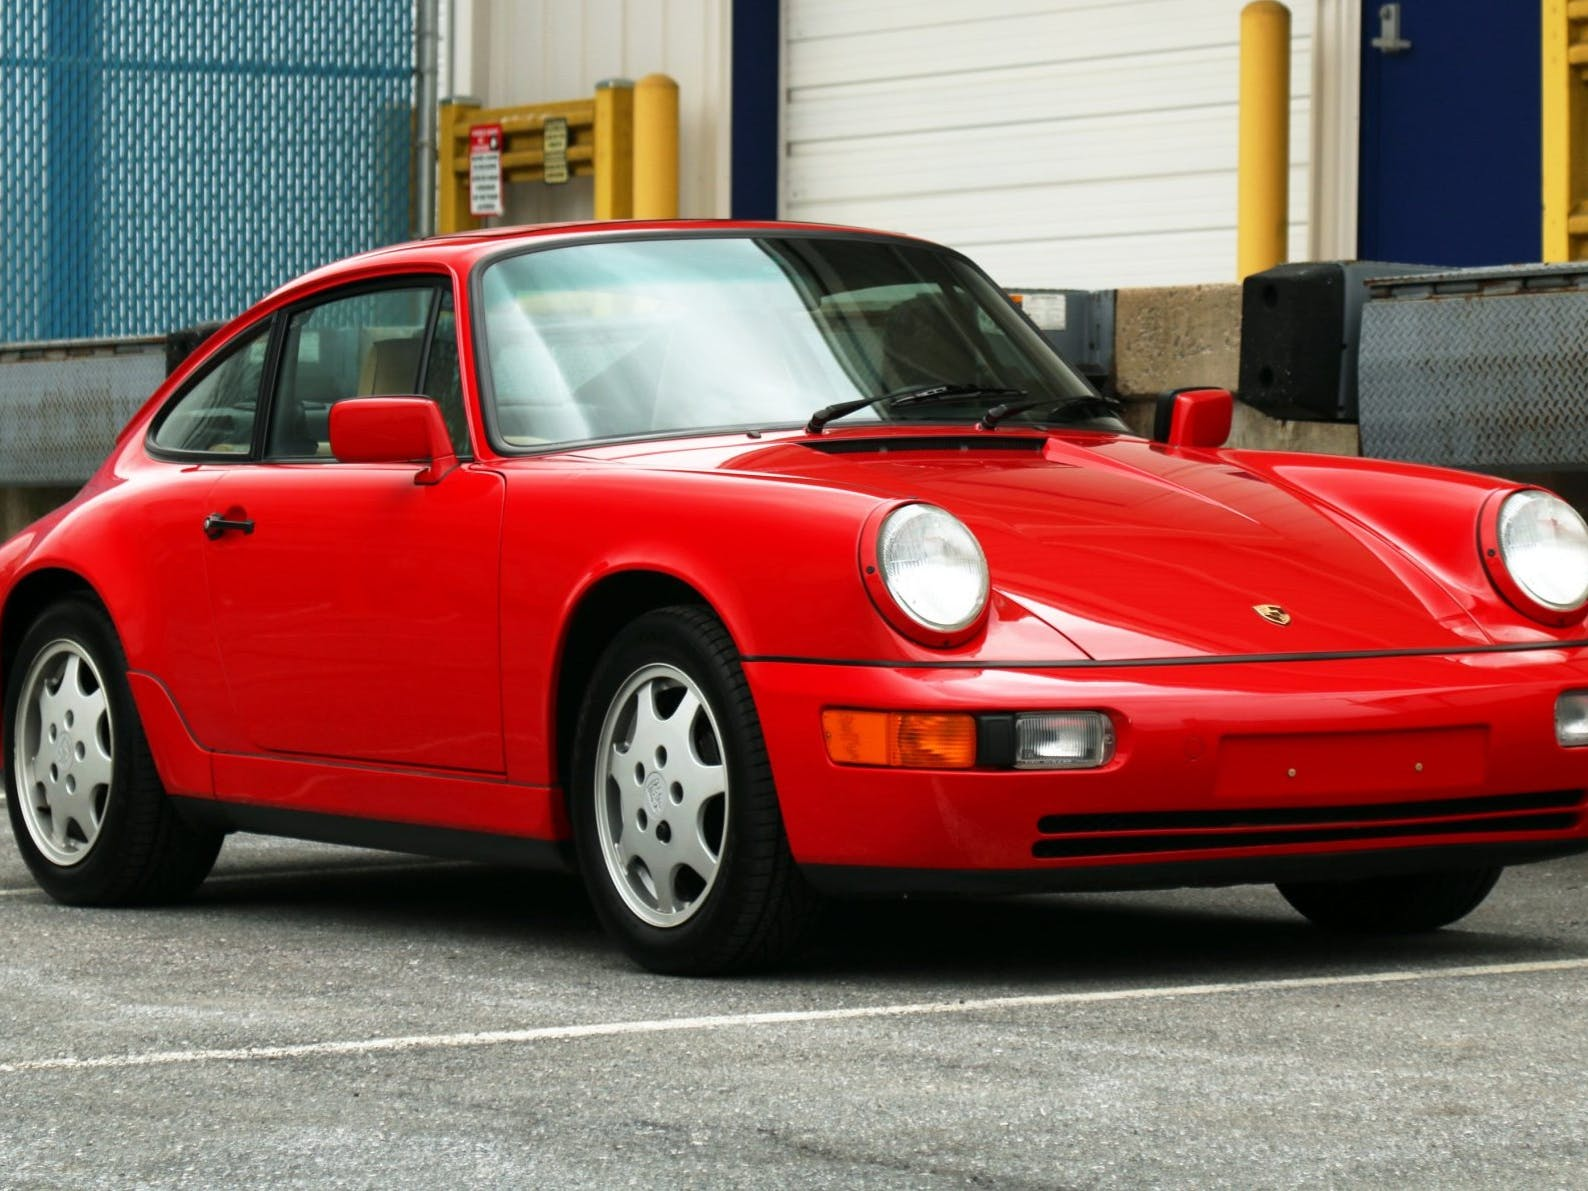 1991 Porsche 911 Carrera 2 Coupe 5-Speed